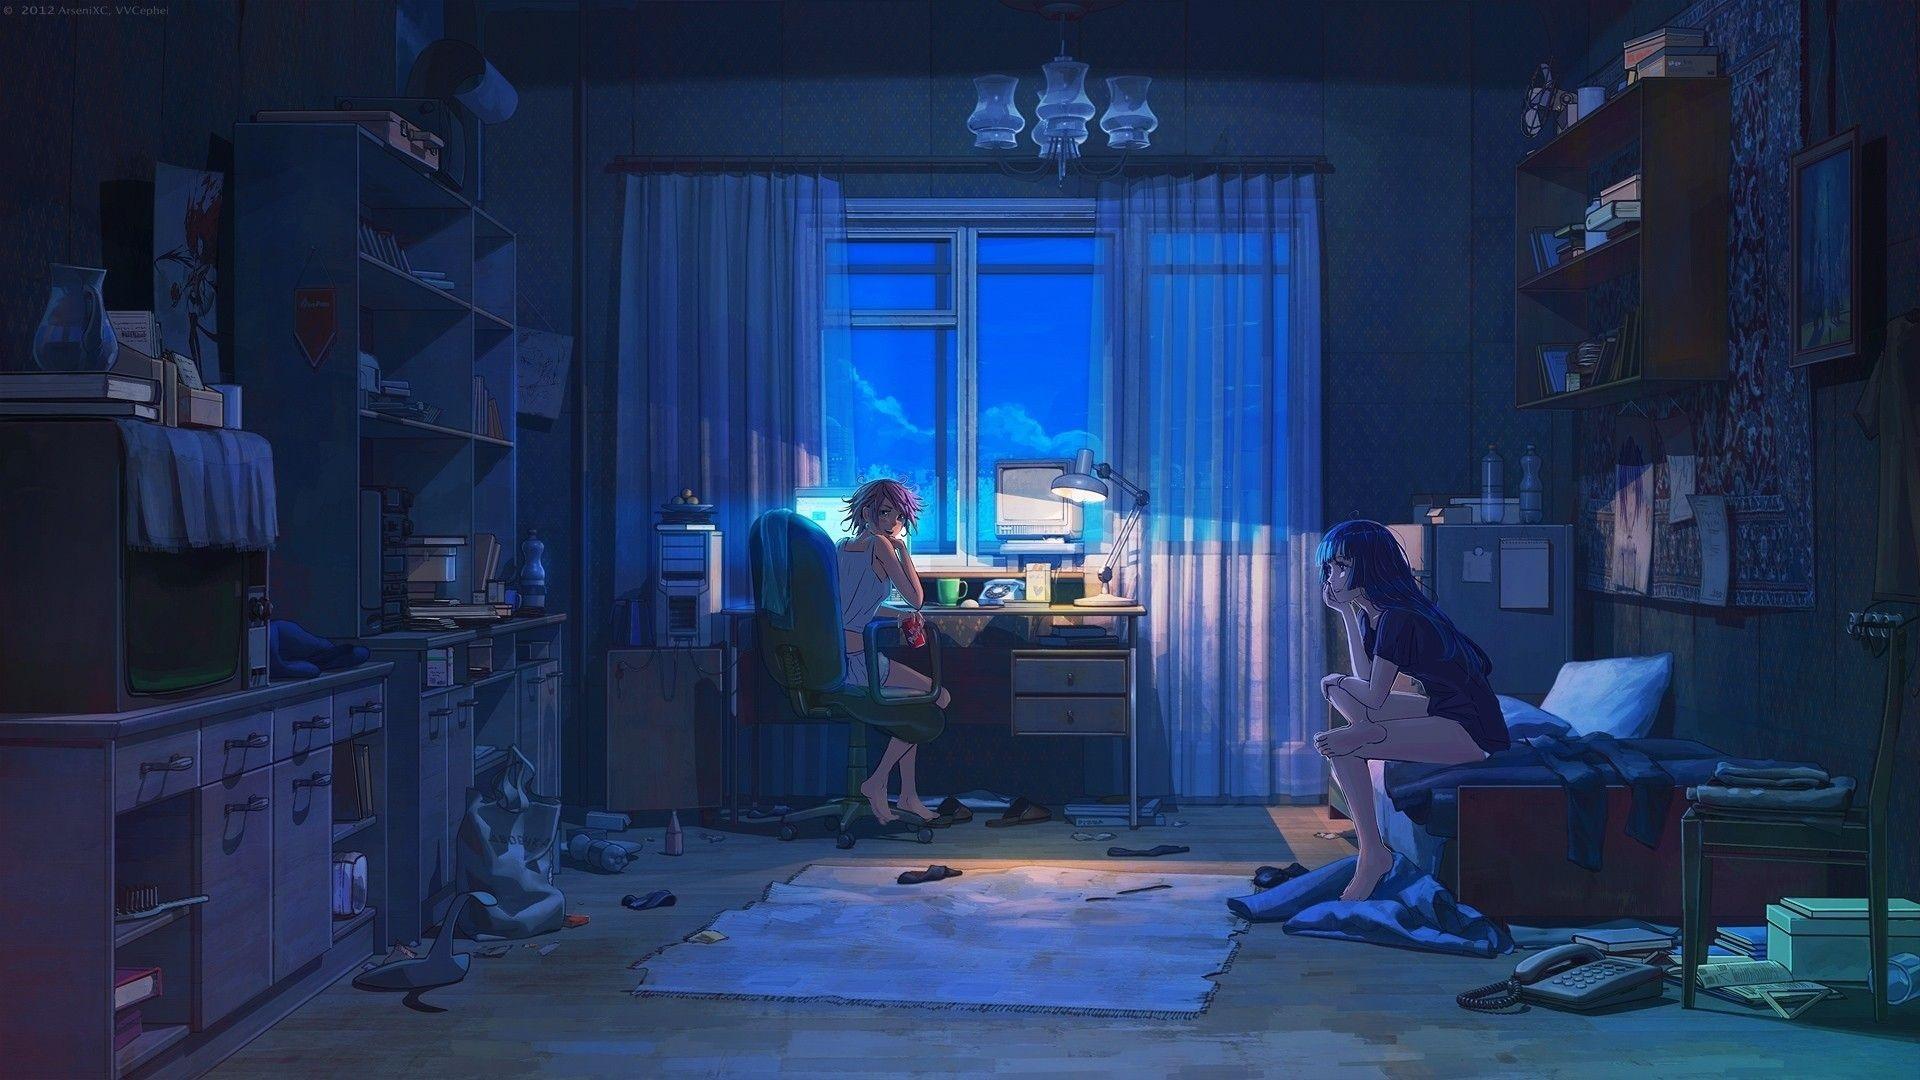 anime bedroom background